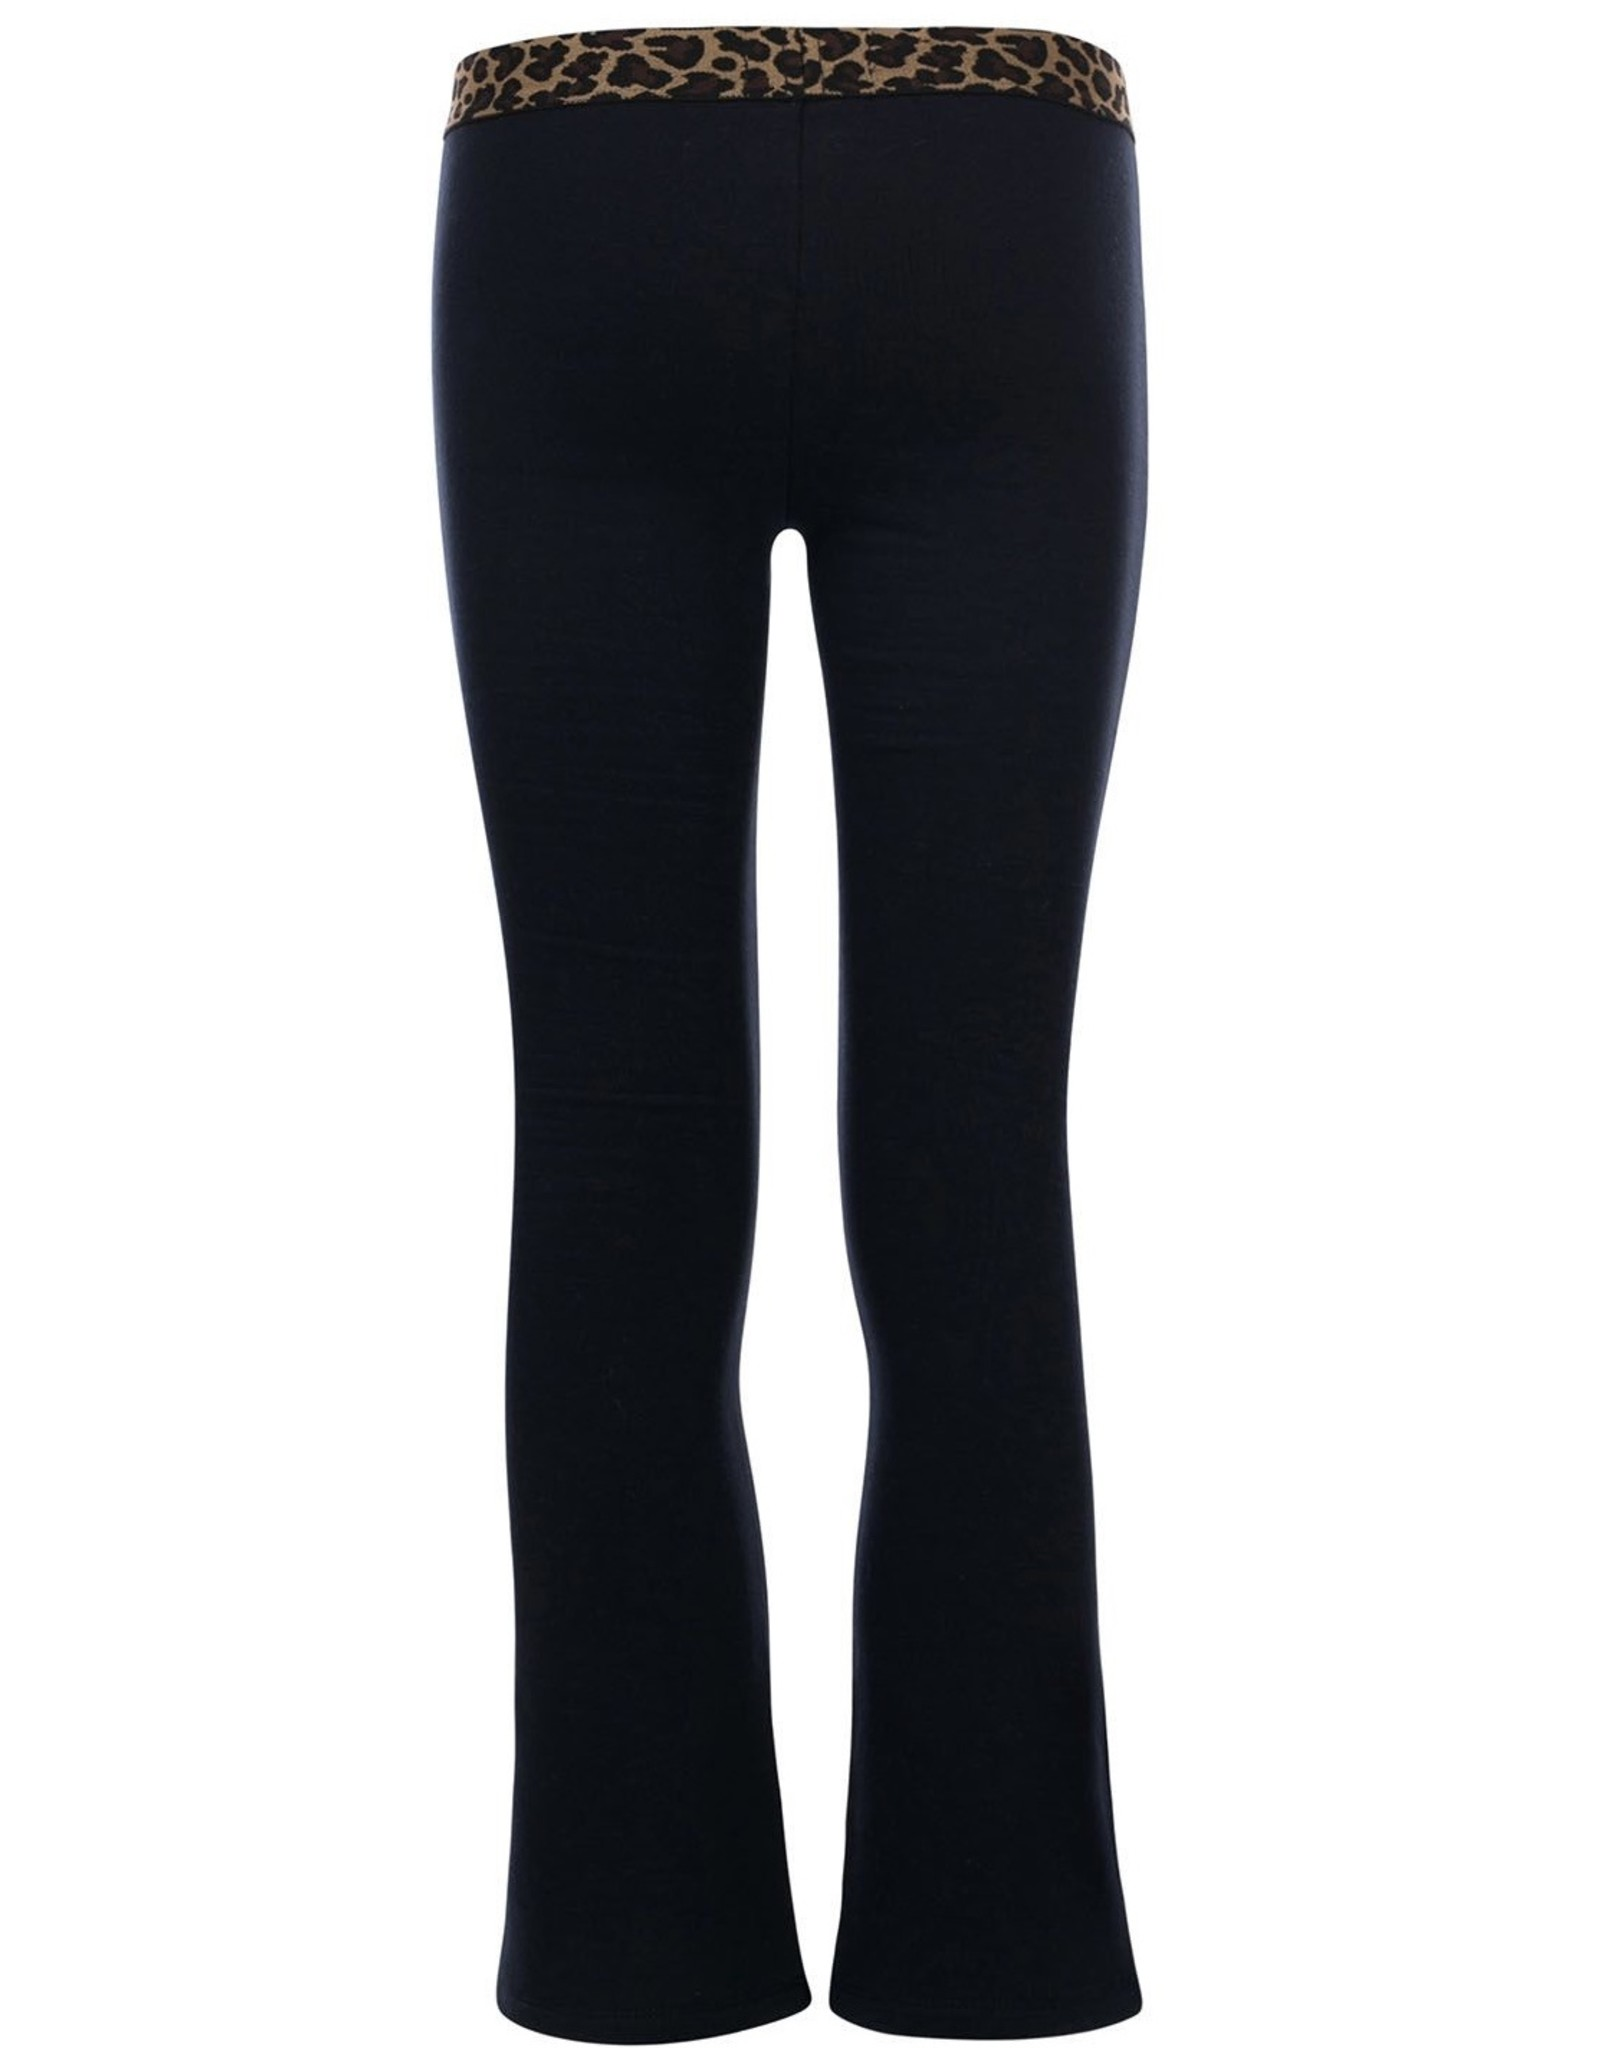 looxs 2131-7614 Pants